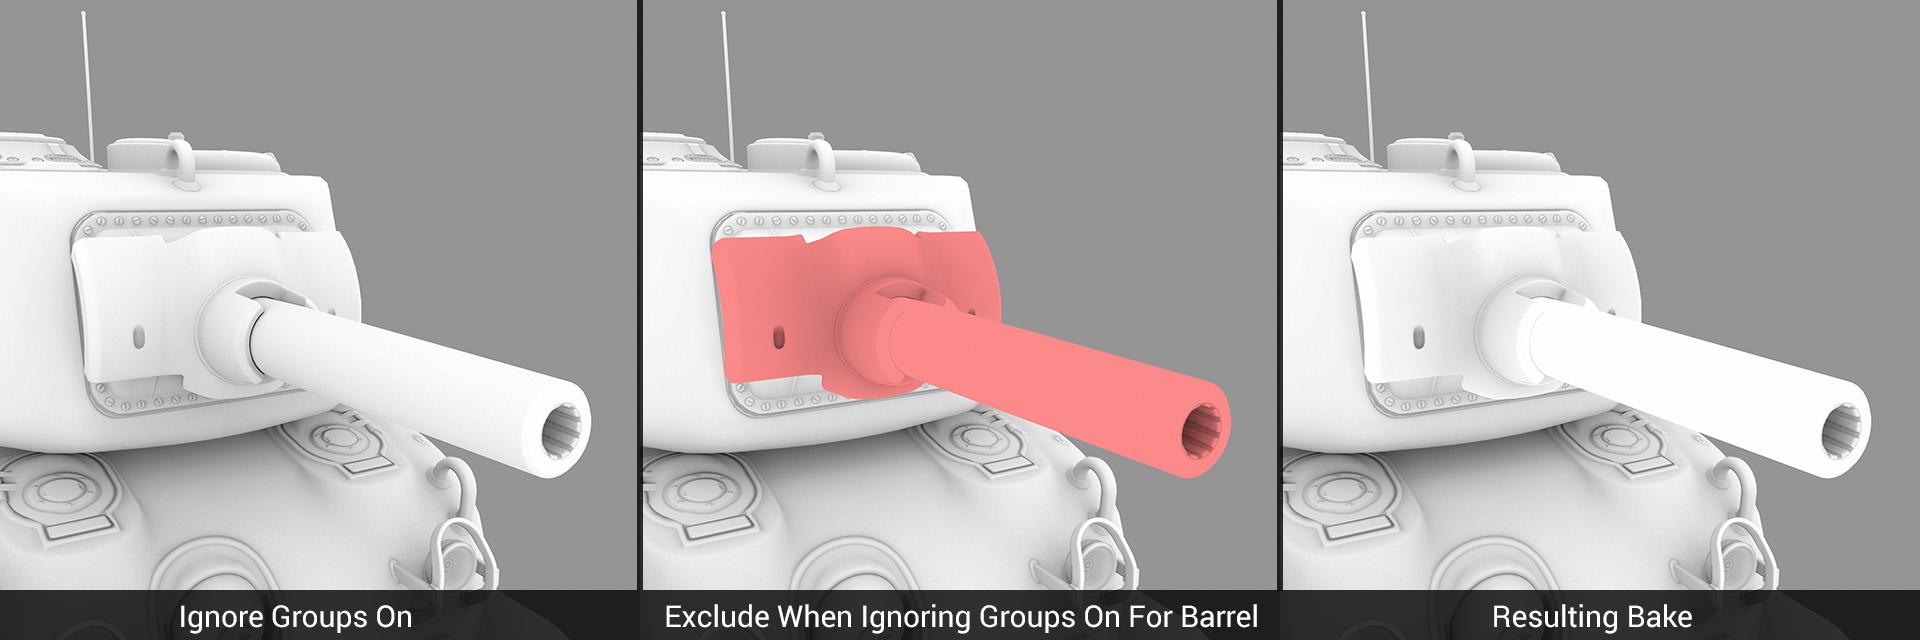 AO Exclude When Ignoring Groups